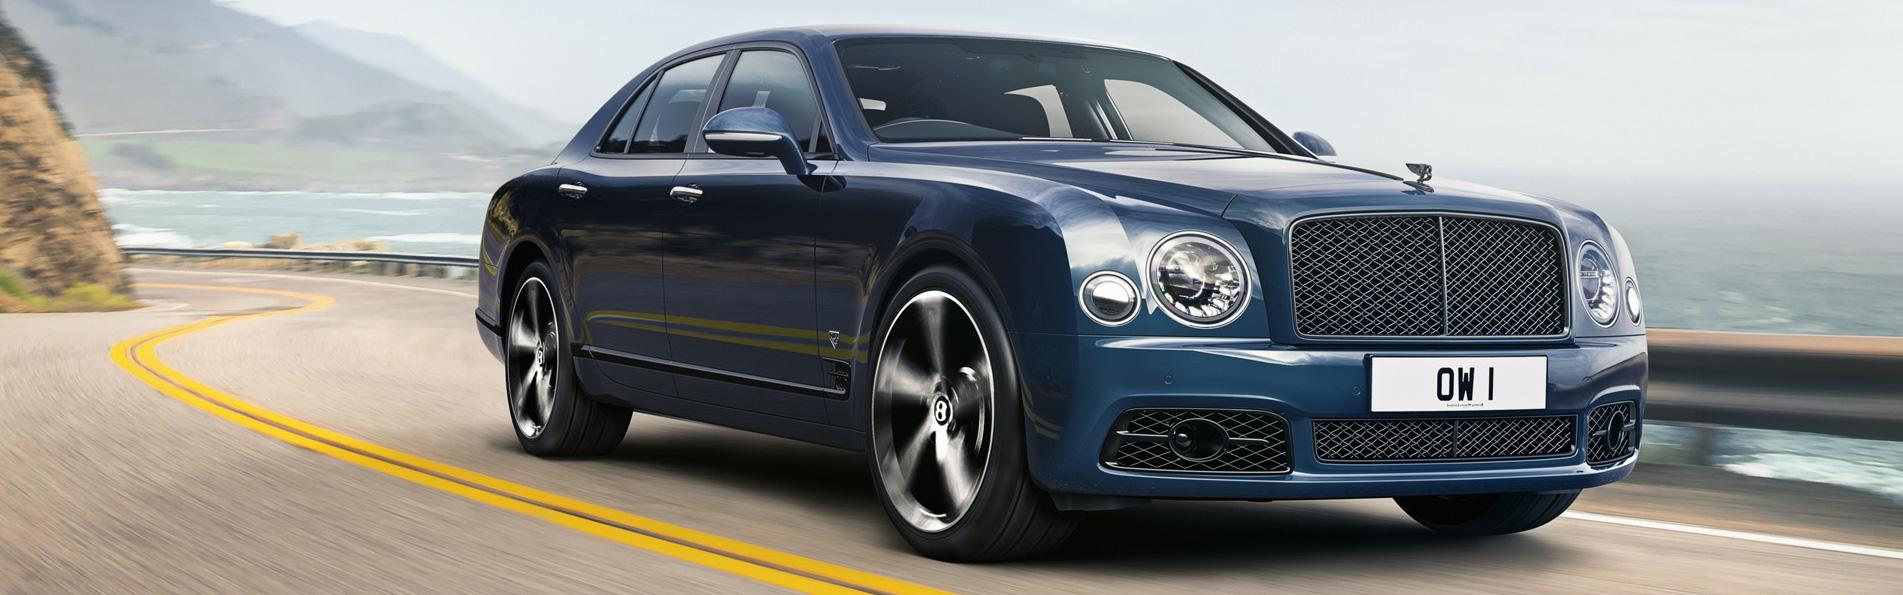 Ảnh ngoại thất Bentley Mulsanne-1